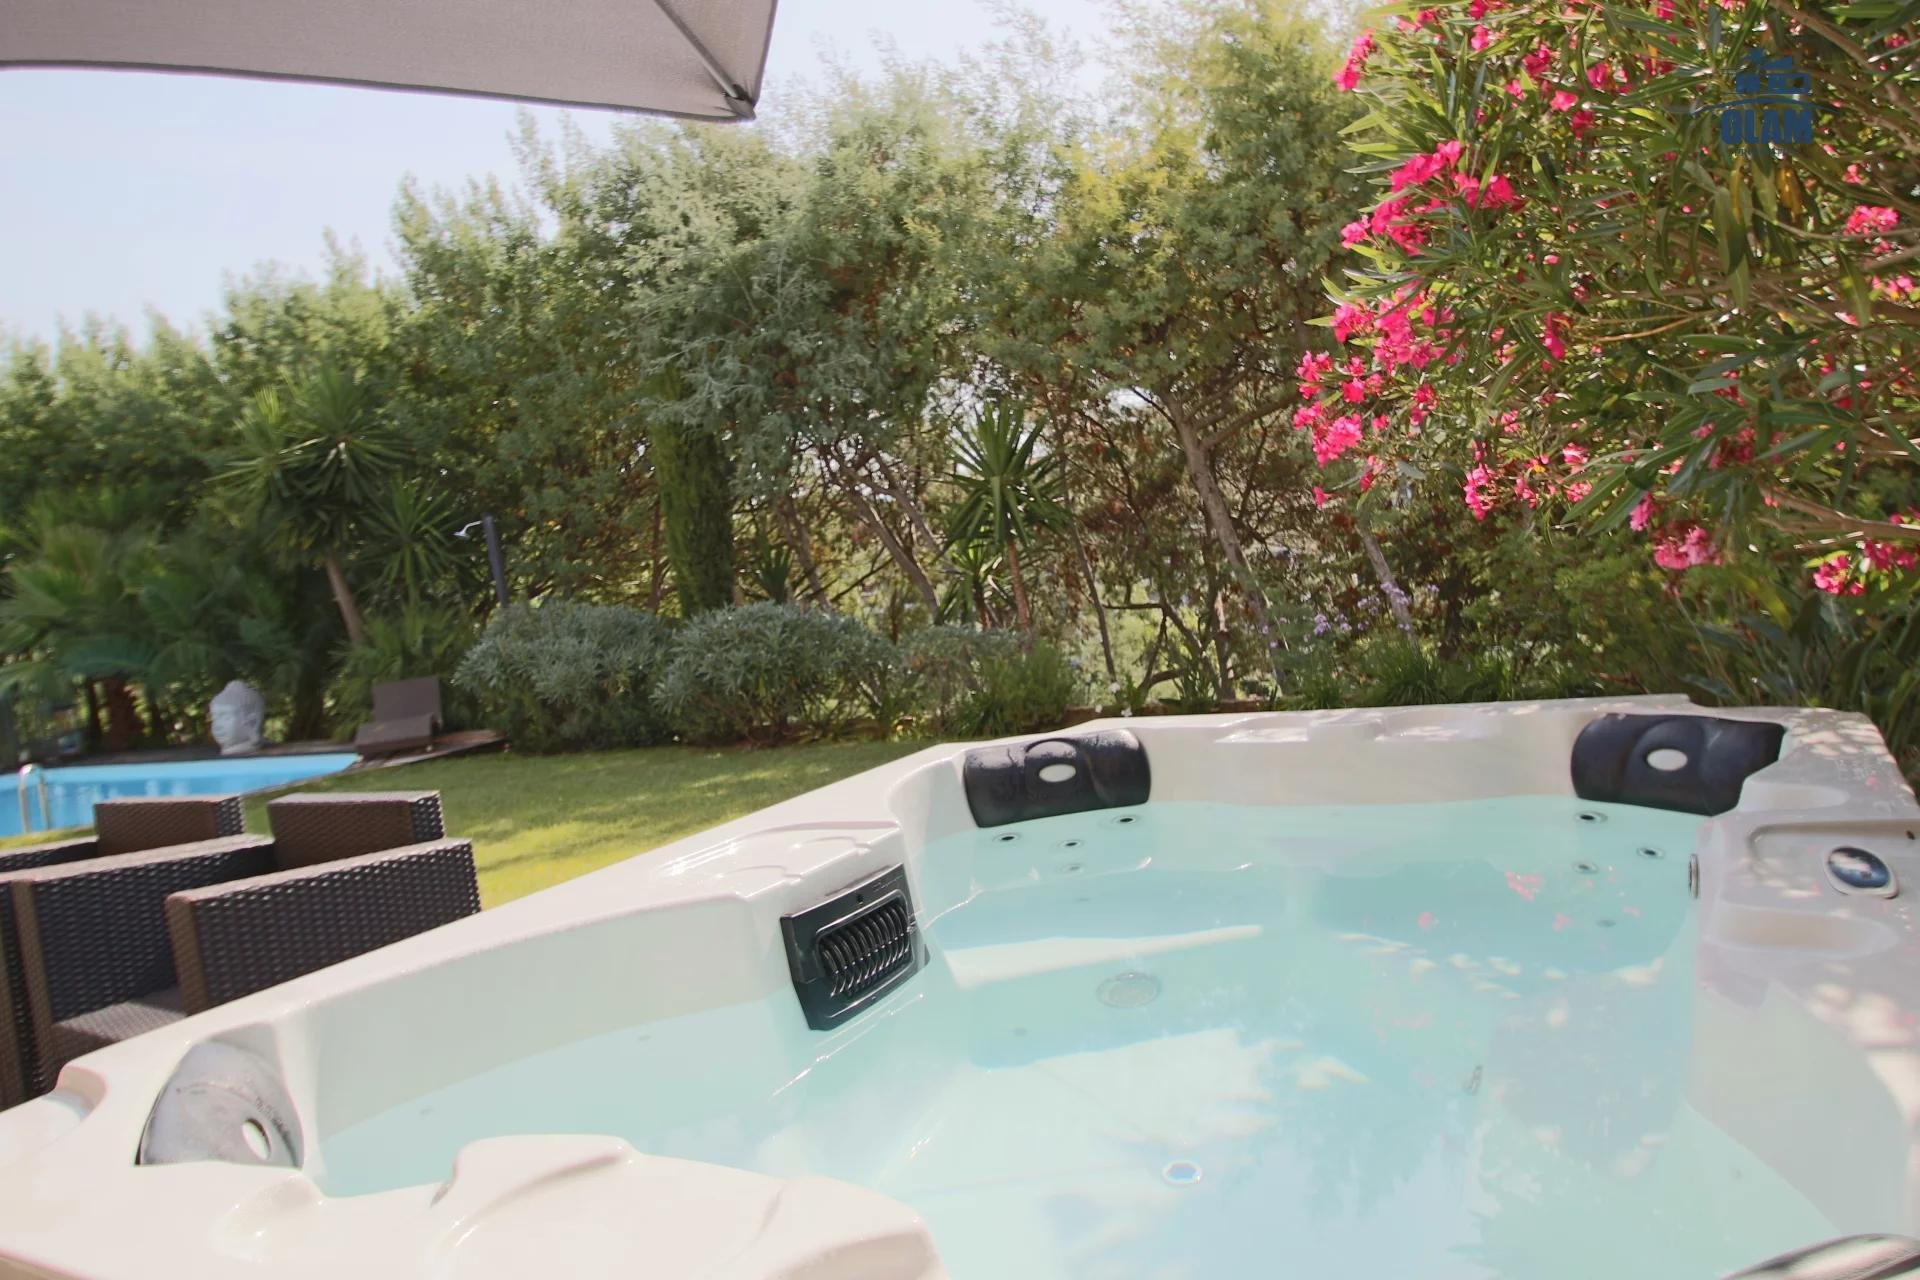 Сезонная аренда Вилла - Канны (Cannes) Croix des Gardes